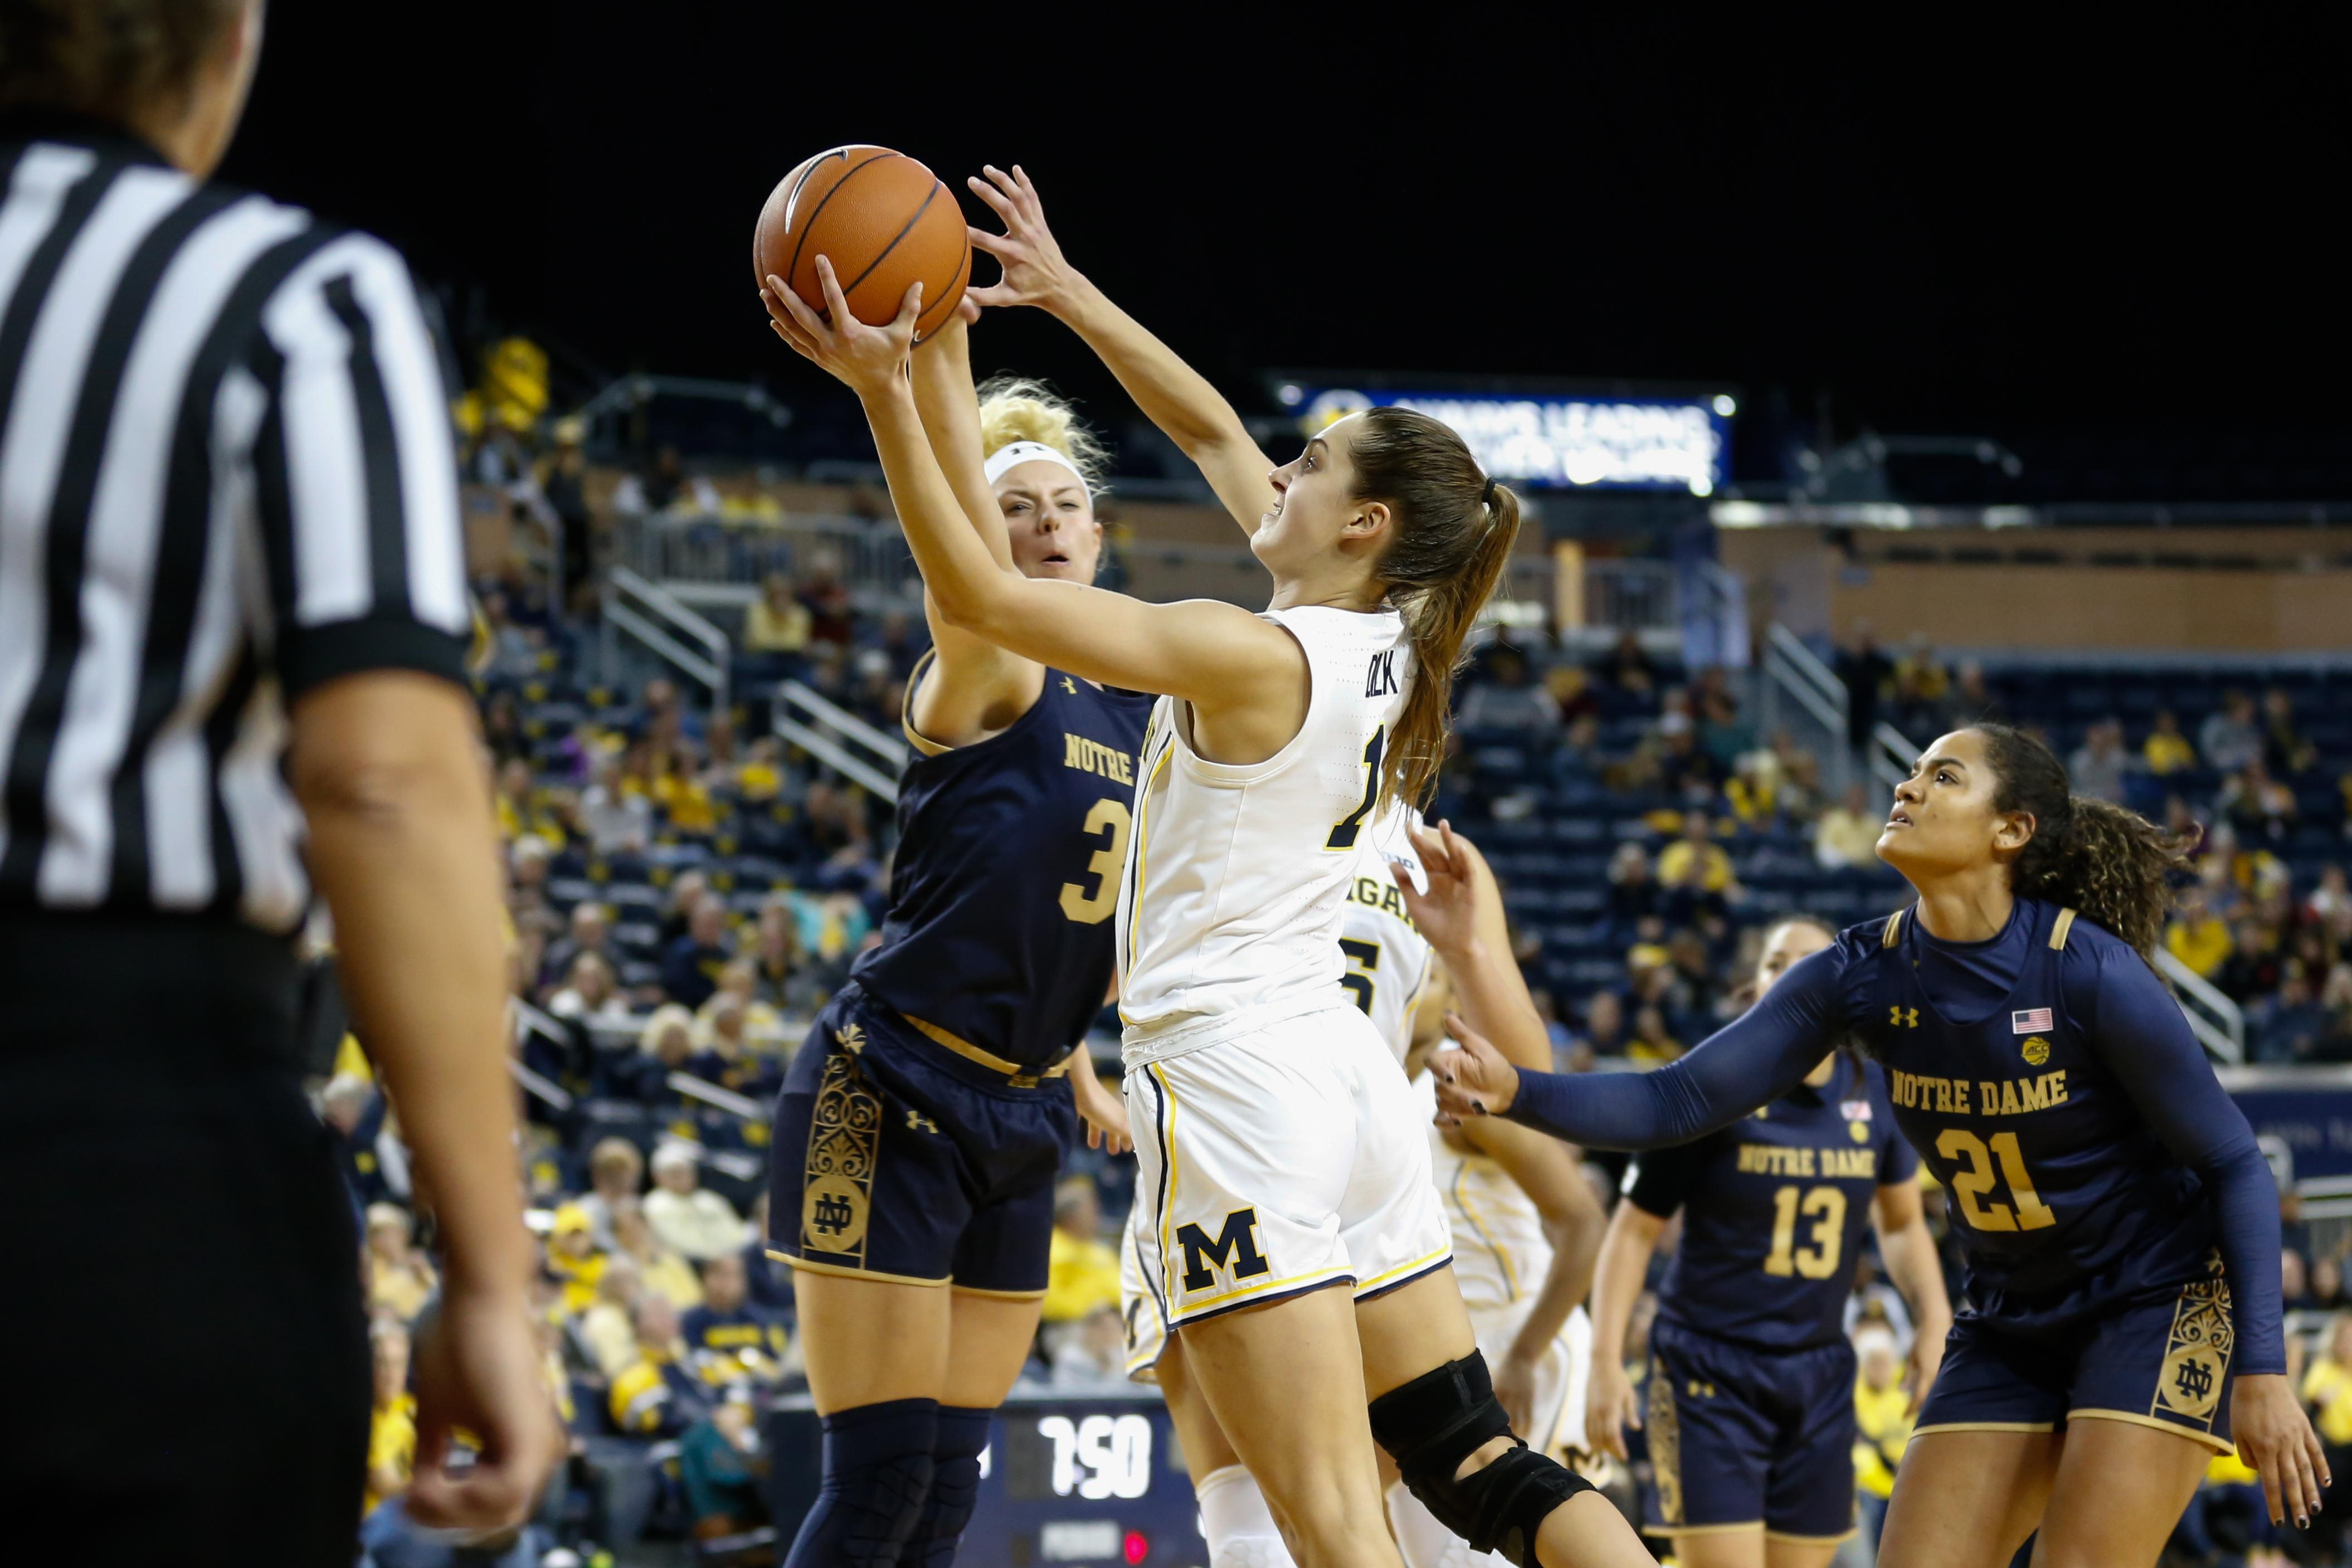 COLLEGE BASKETBALL: NOV 23 Women's Notre Dame at Michigan